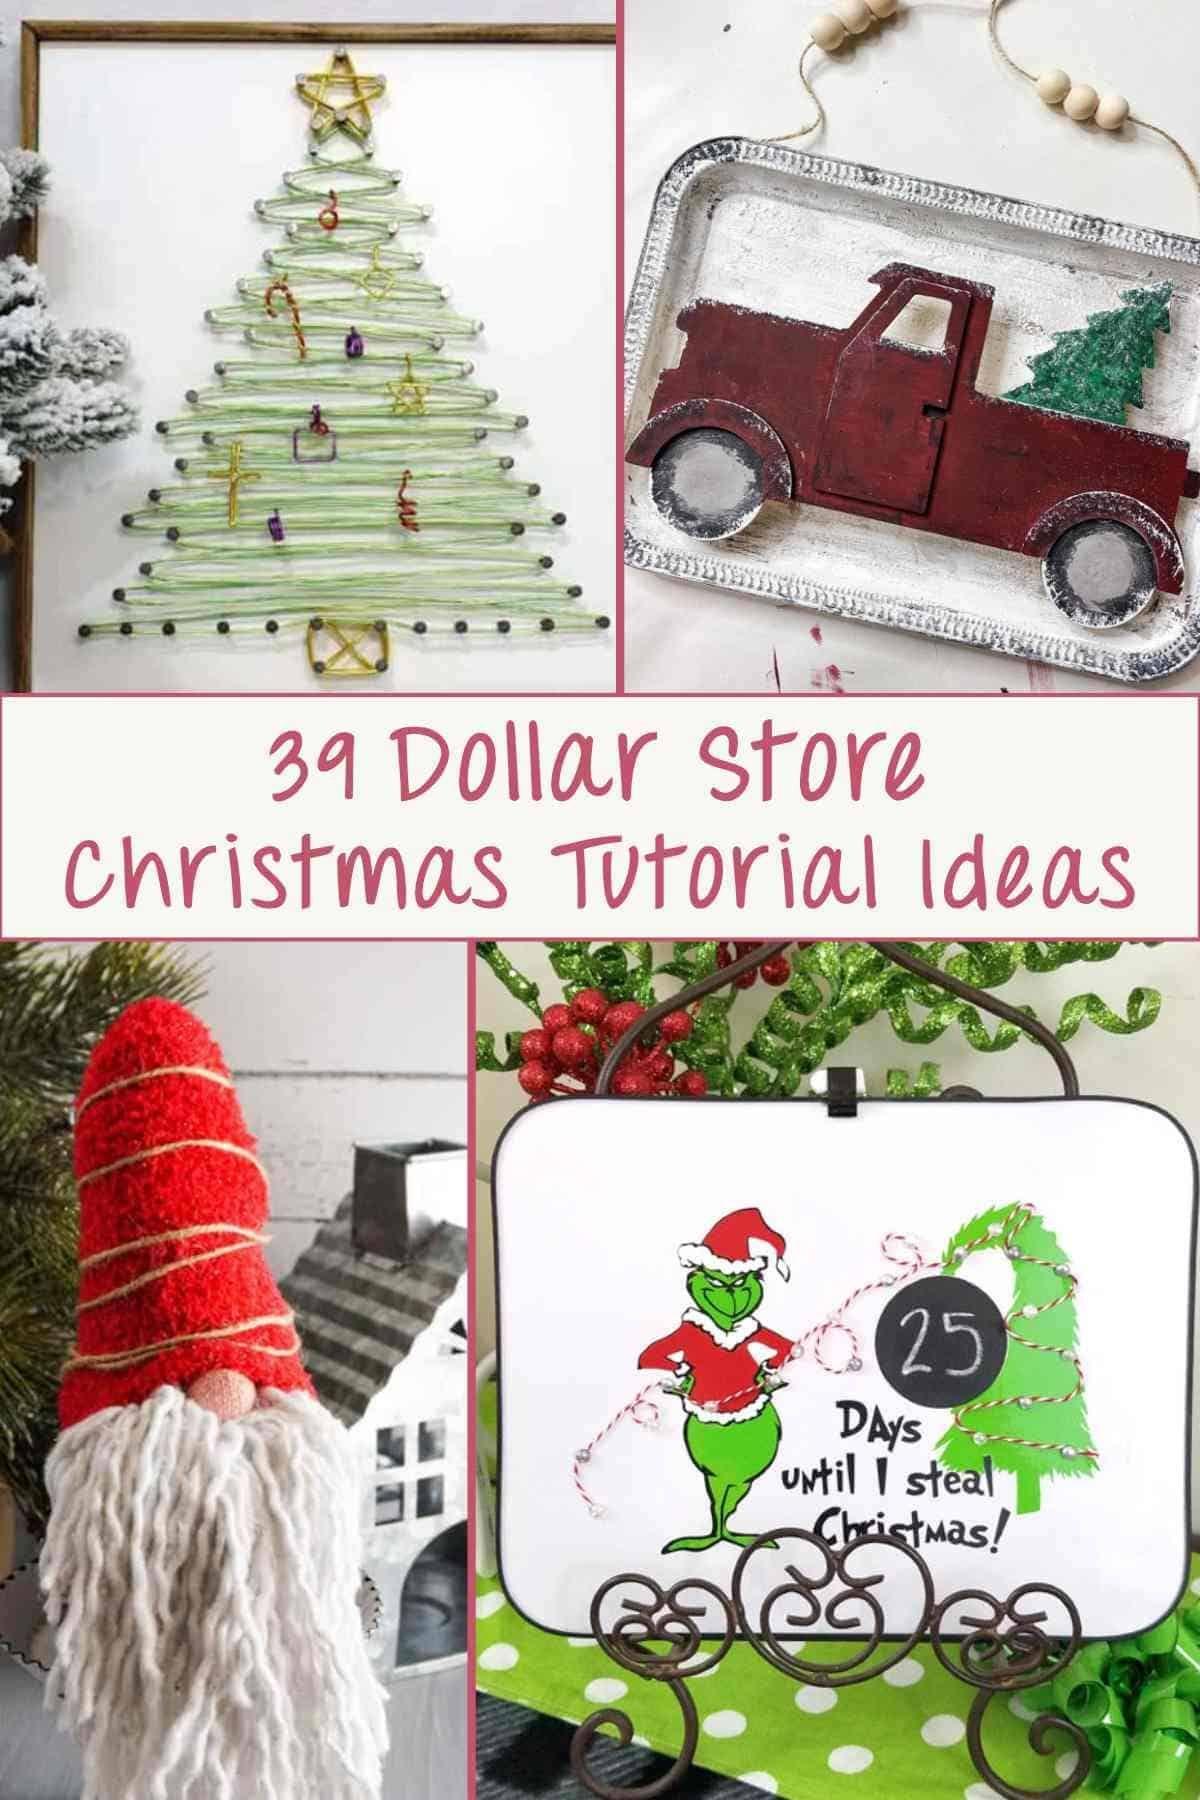 39 Diy Dollar Tree Christmas Crafts Decor Artsy Pretty Plants Christmas Crafts Christmas Crafts Diy Fun Christmas Decorations